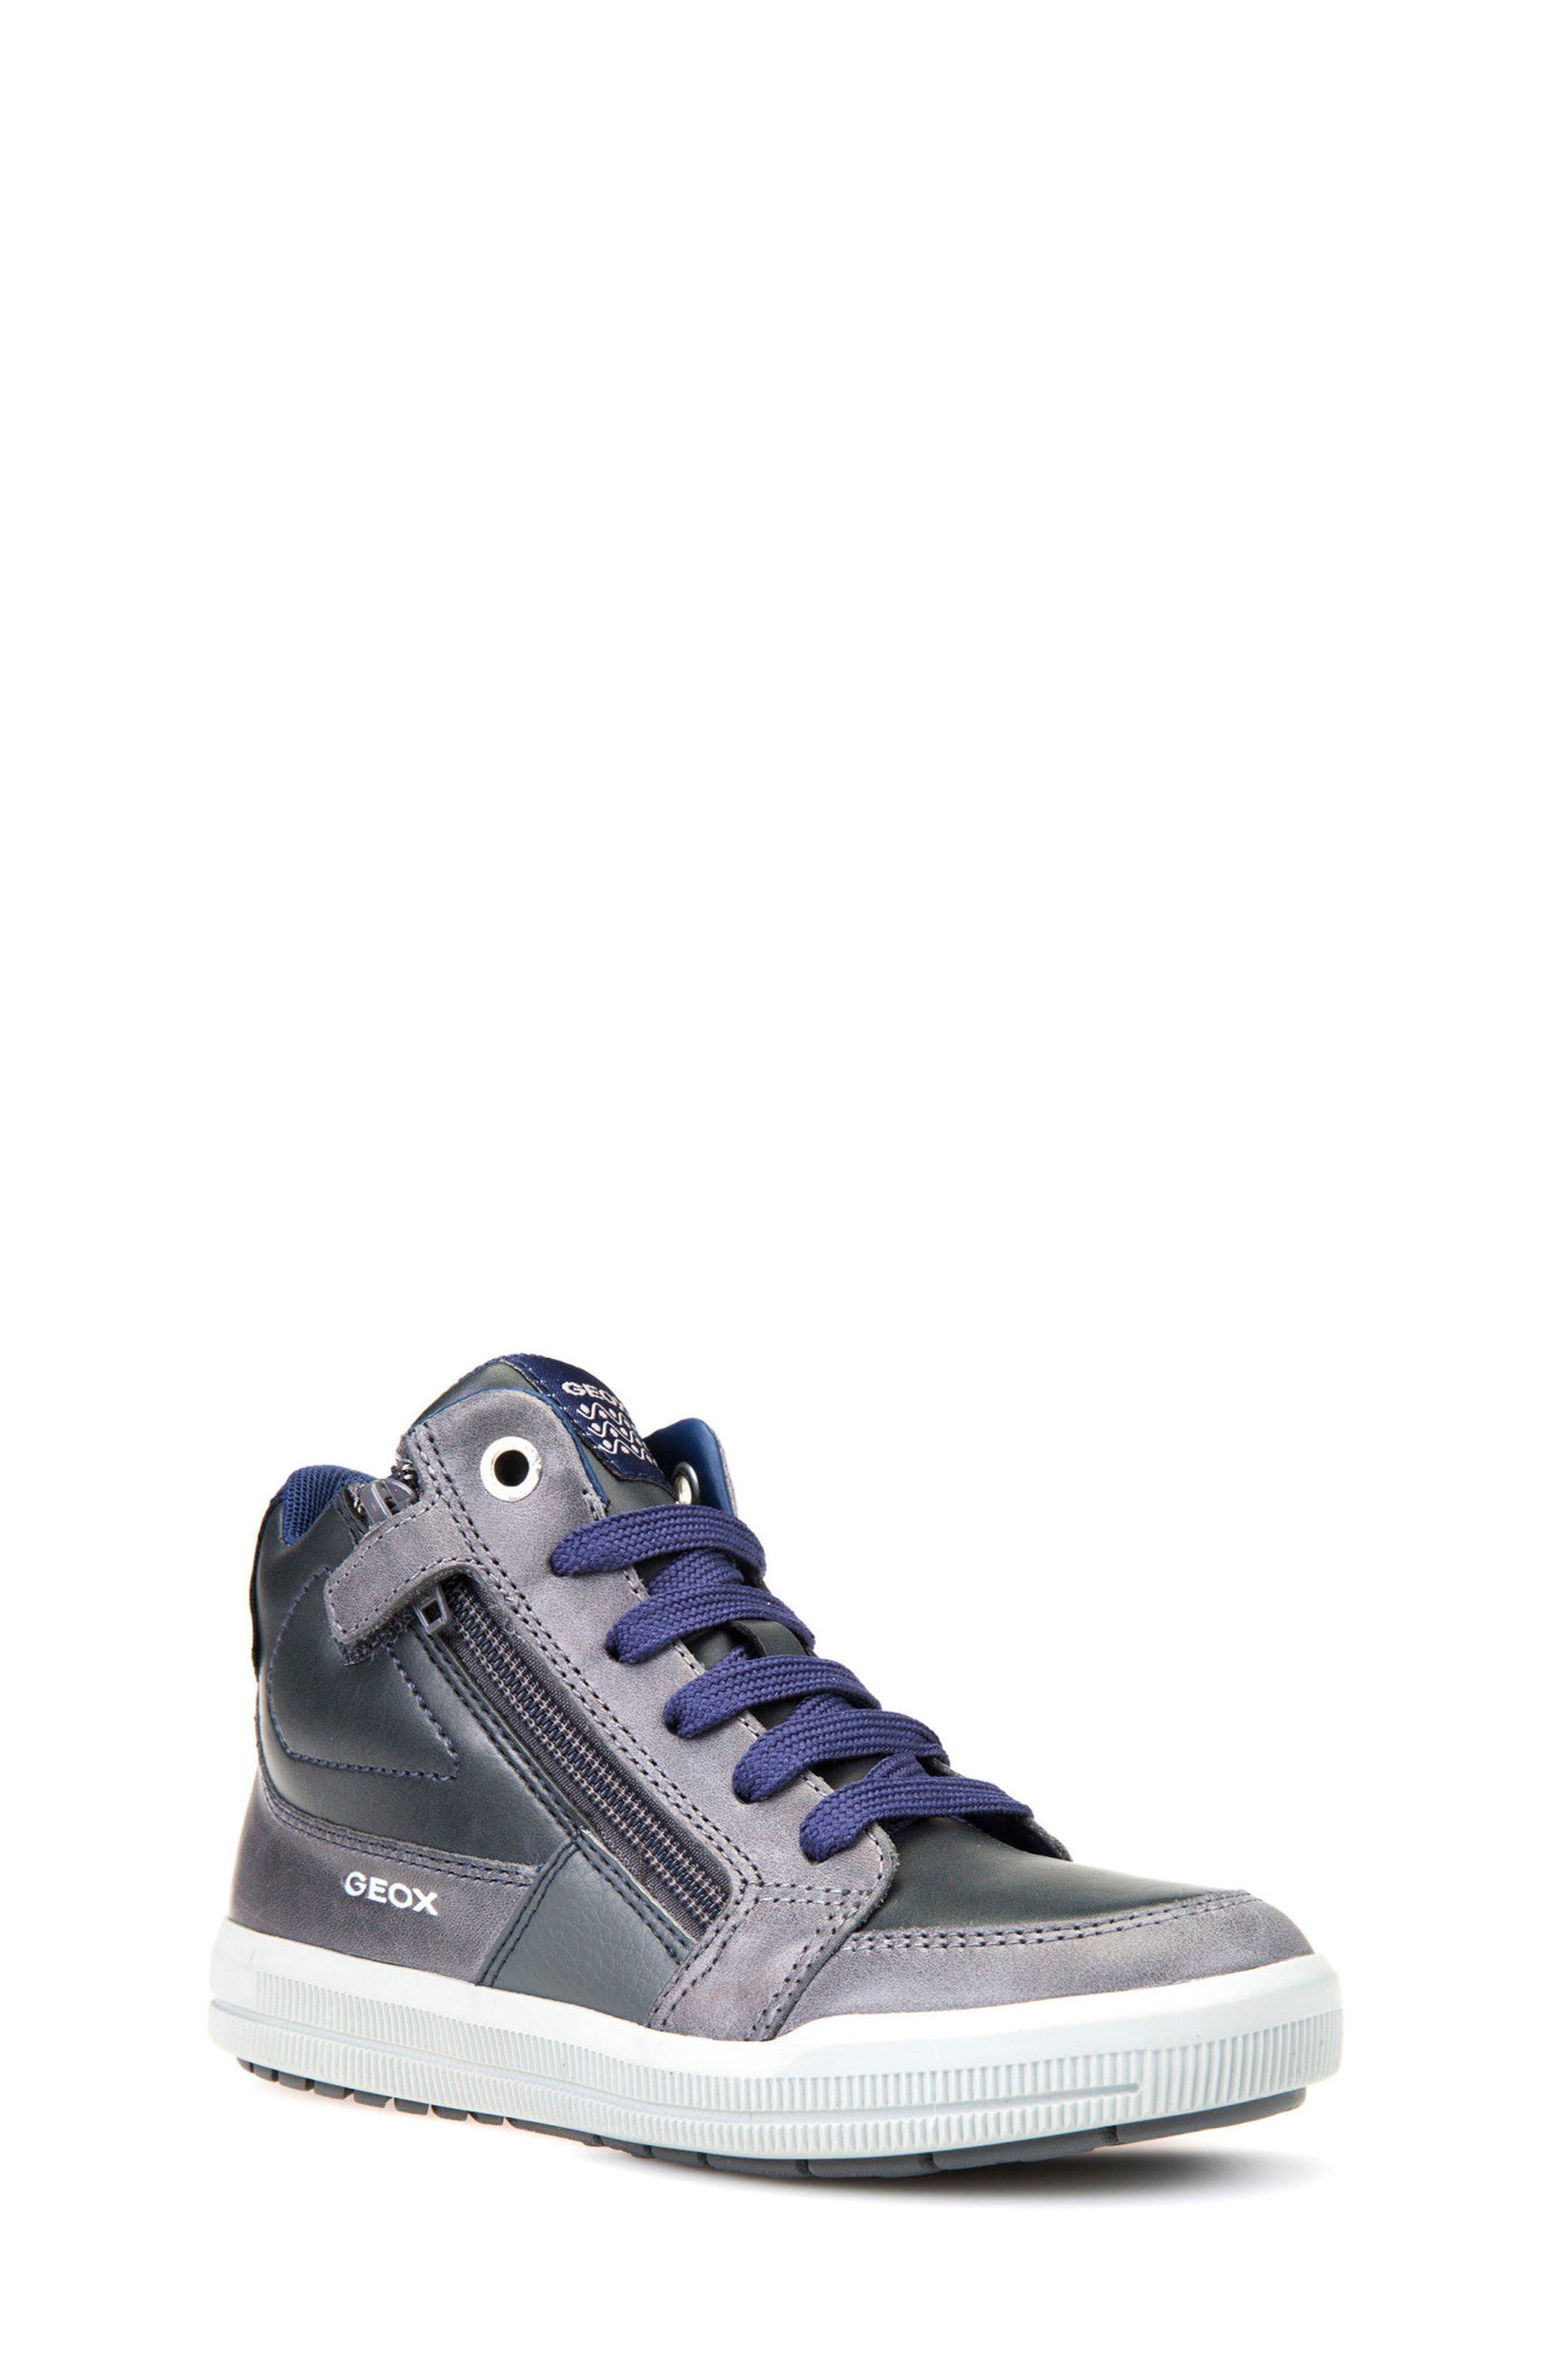 Geox Arzach High Top Sneaker (Toddler, Little Kid & Big Kid)